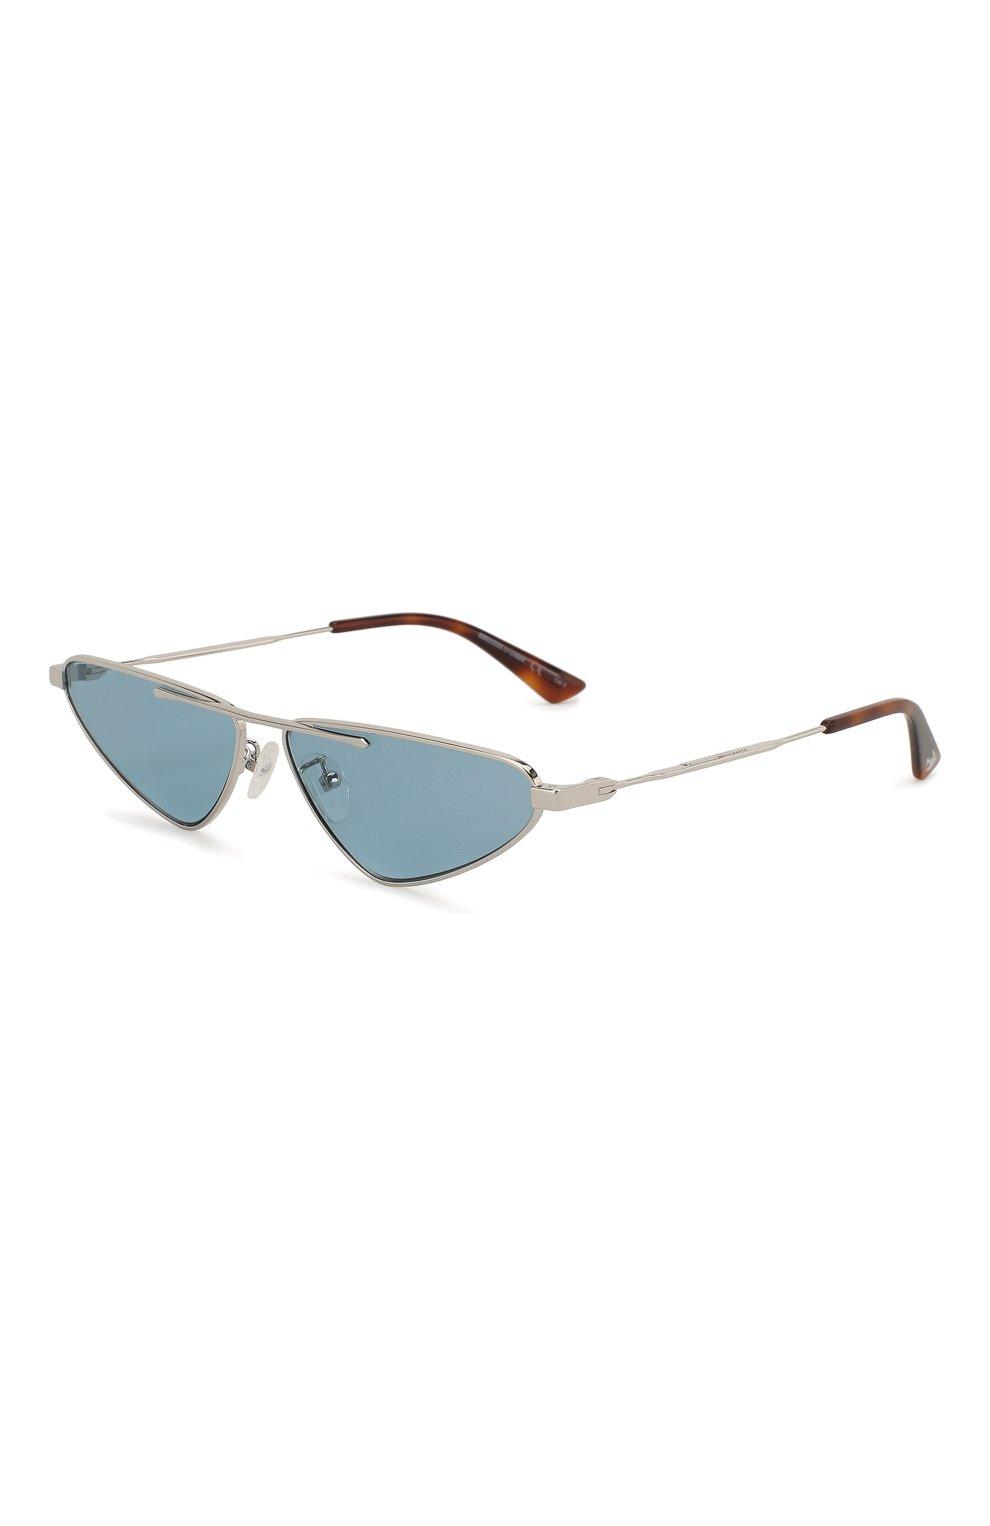 Женские солнцезащитные очки MCQ SWALLOW голубого цвета, арт. MQ0226 004 | Фото 1 (Тип очков: С/з; Статус проверки: Проверена категория; Оптика Гендер: оптика-унисекс; Очки форма: Узкие, D-форма)